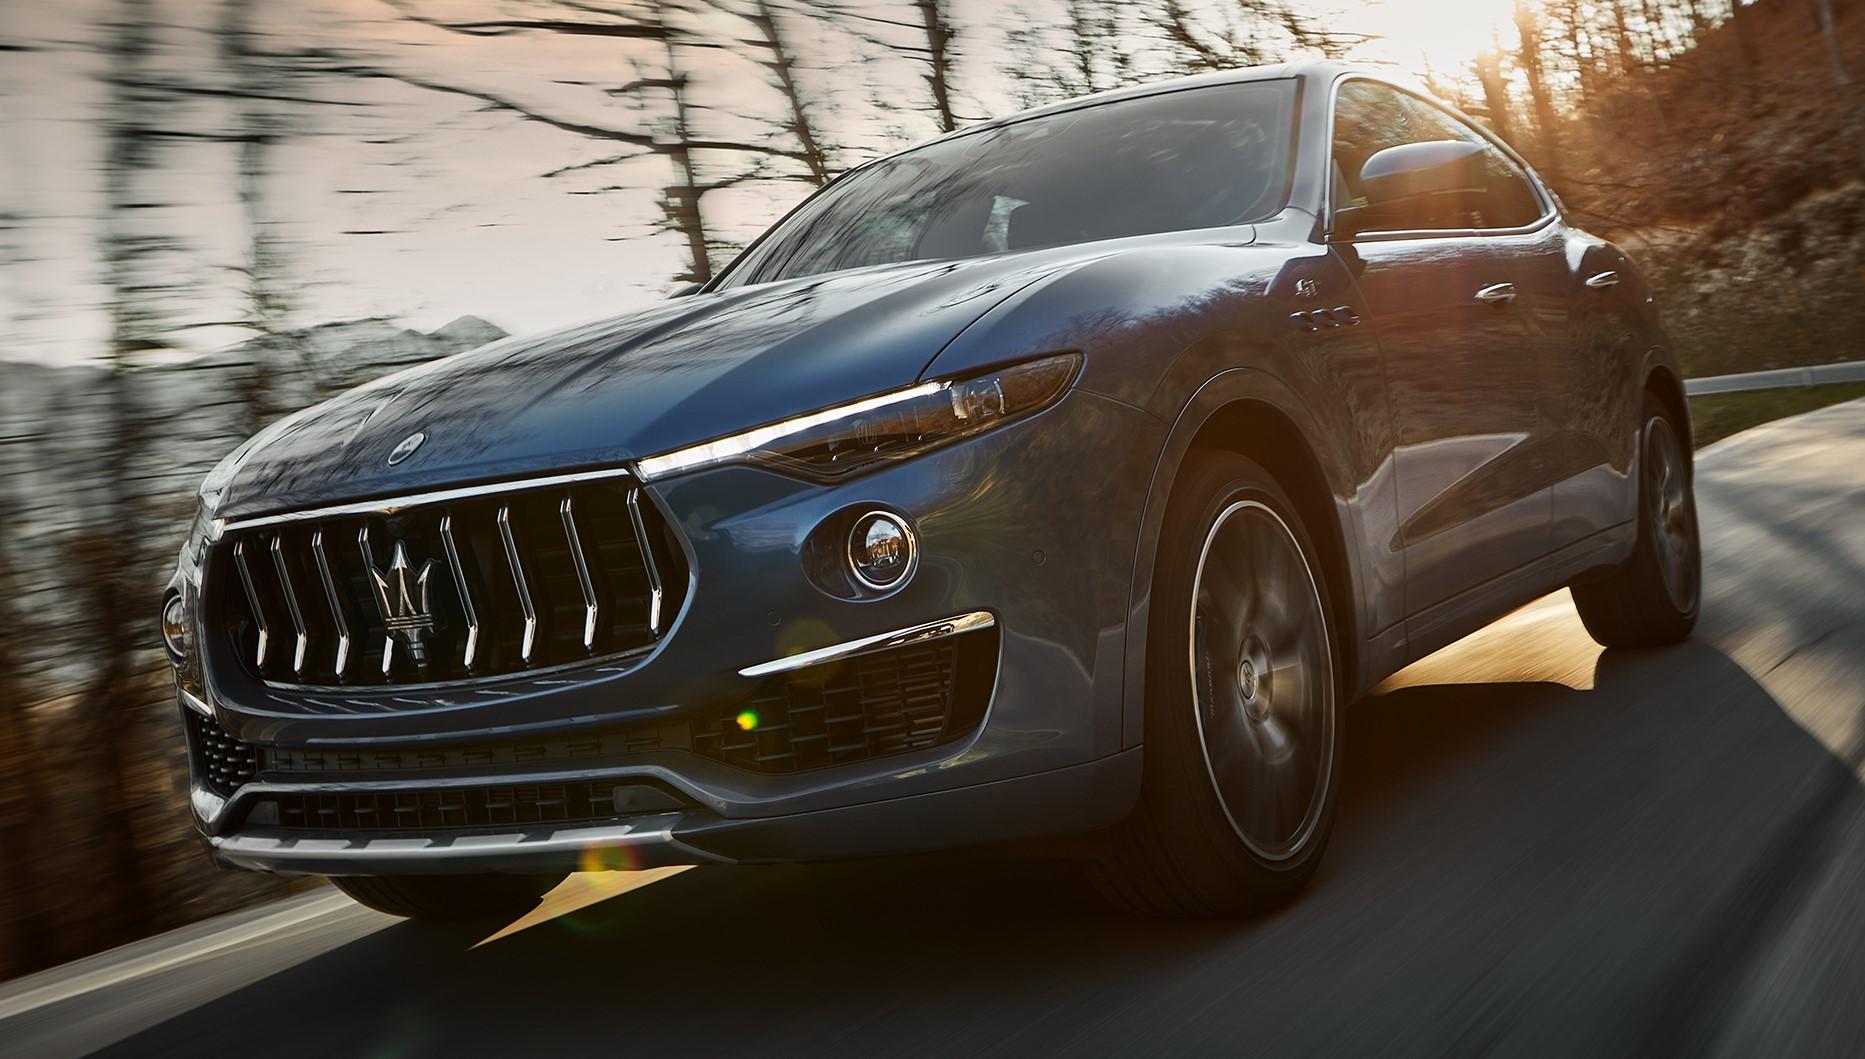 The new Maserati Levante Hybrid is unveiled